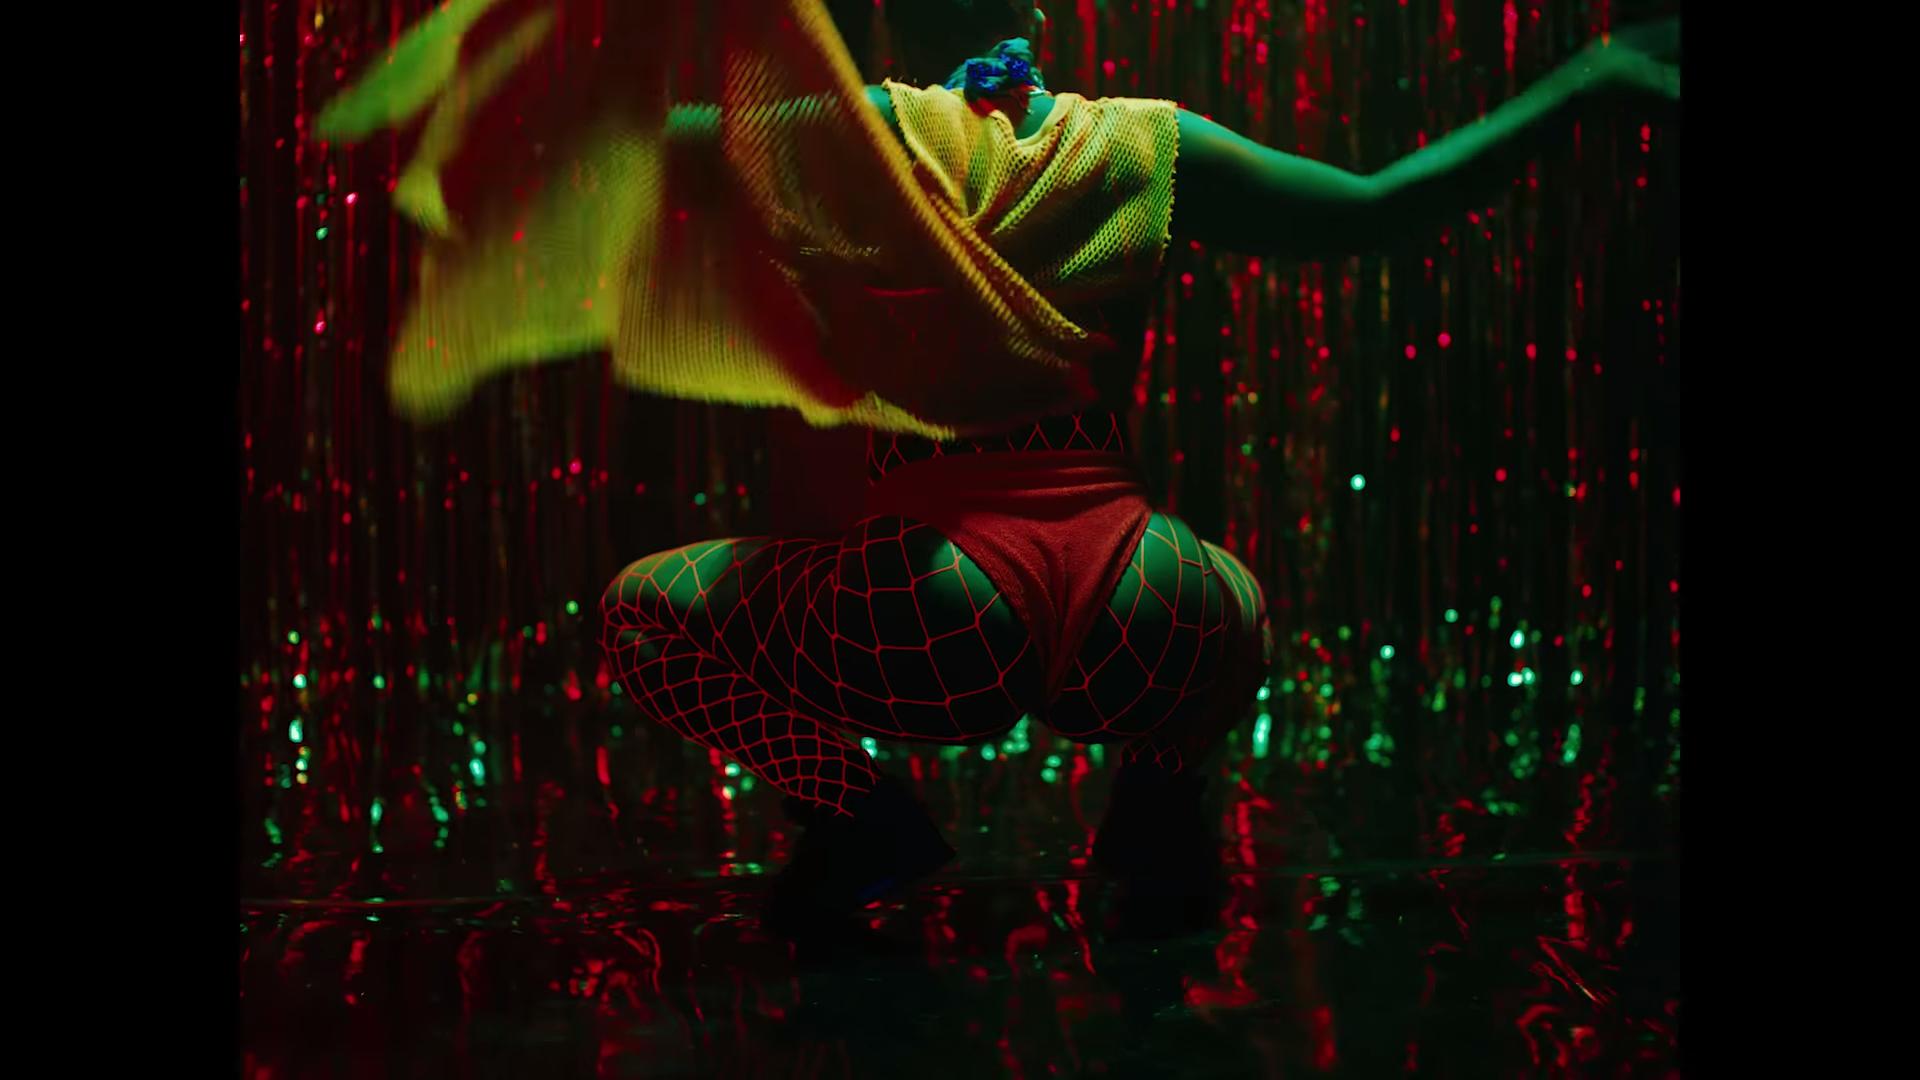 Popcaan - Body So Good (Official Video) 1-35 screenshot